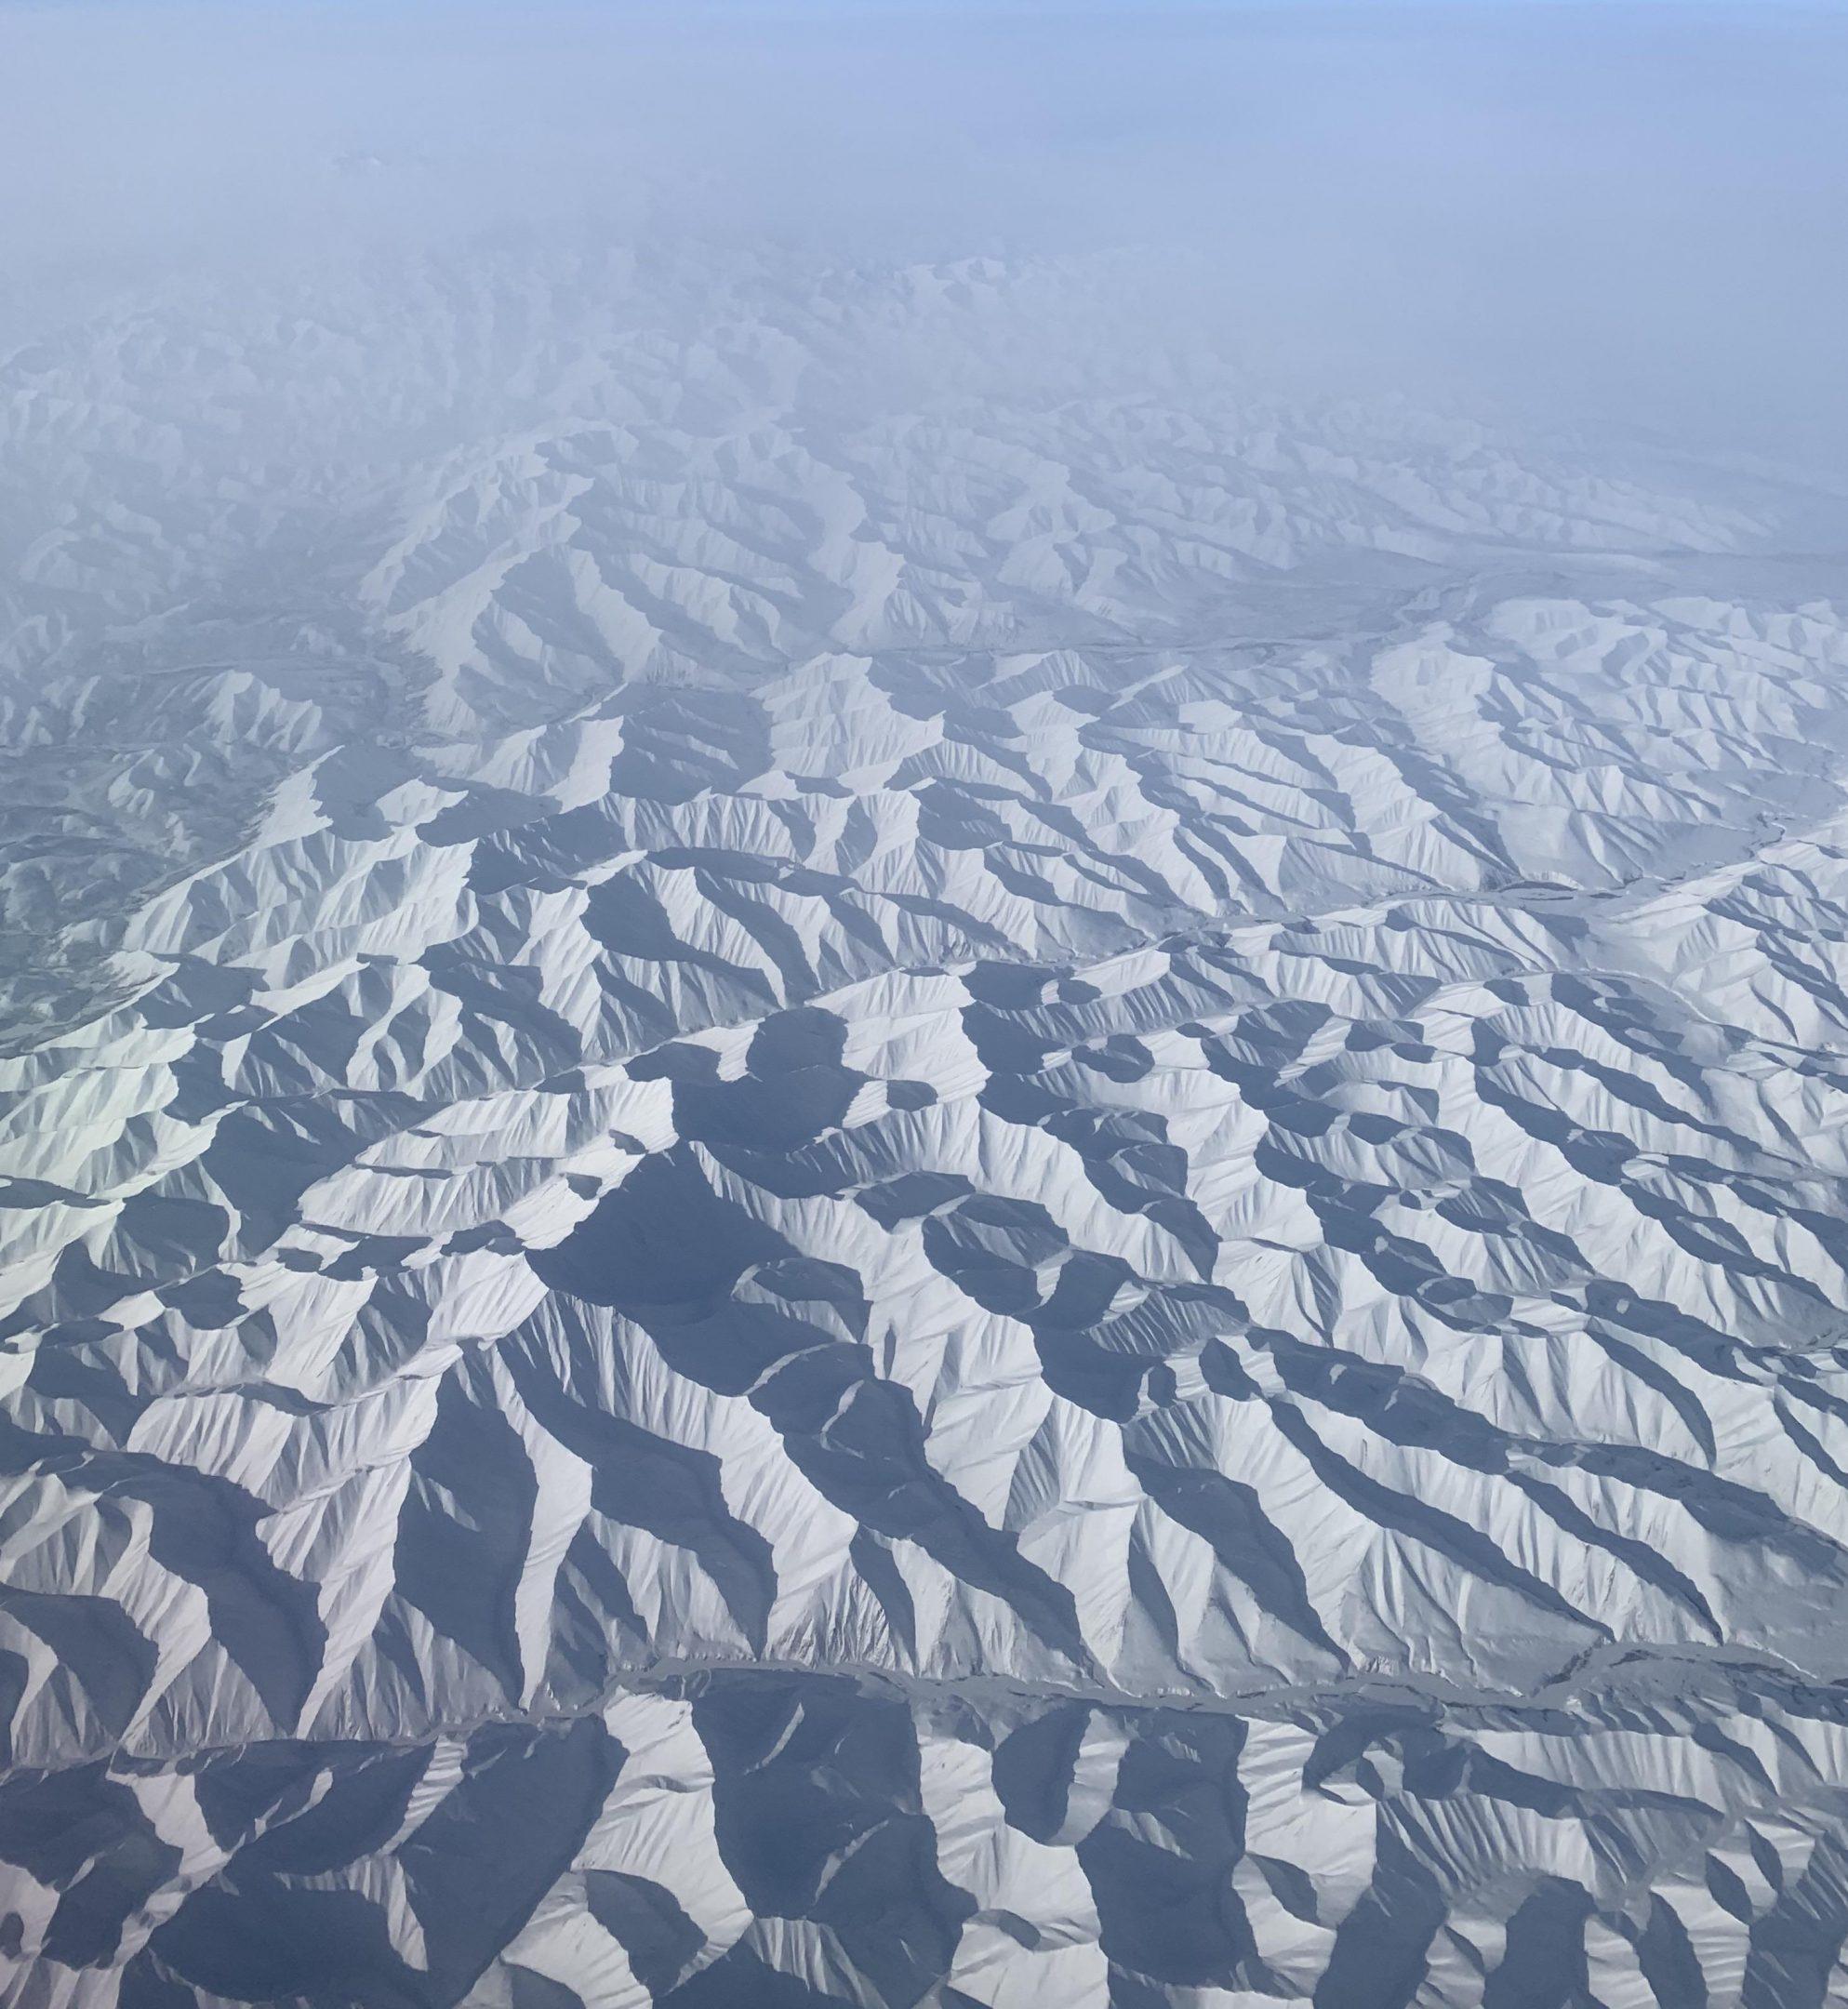 Siberian mountains